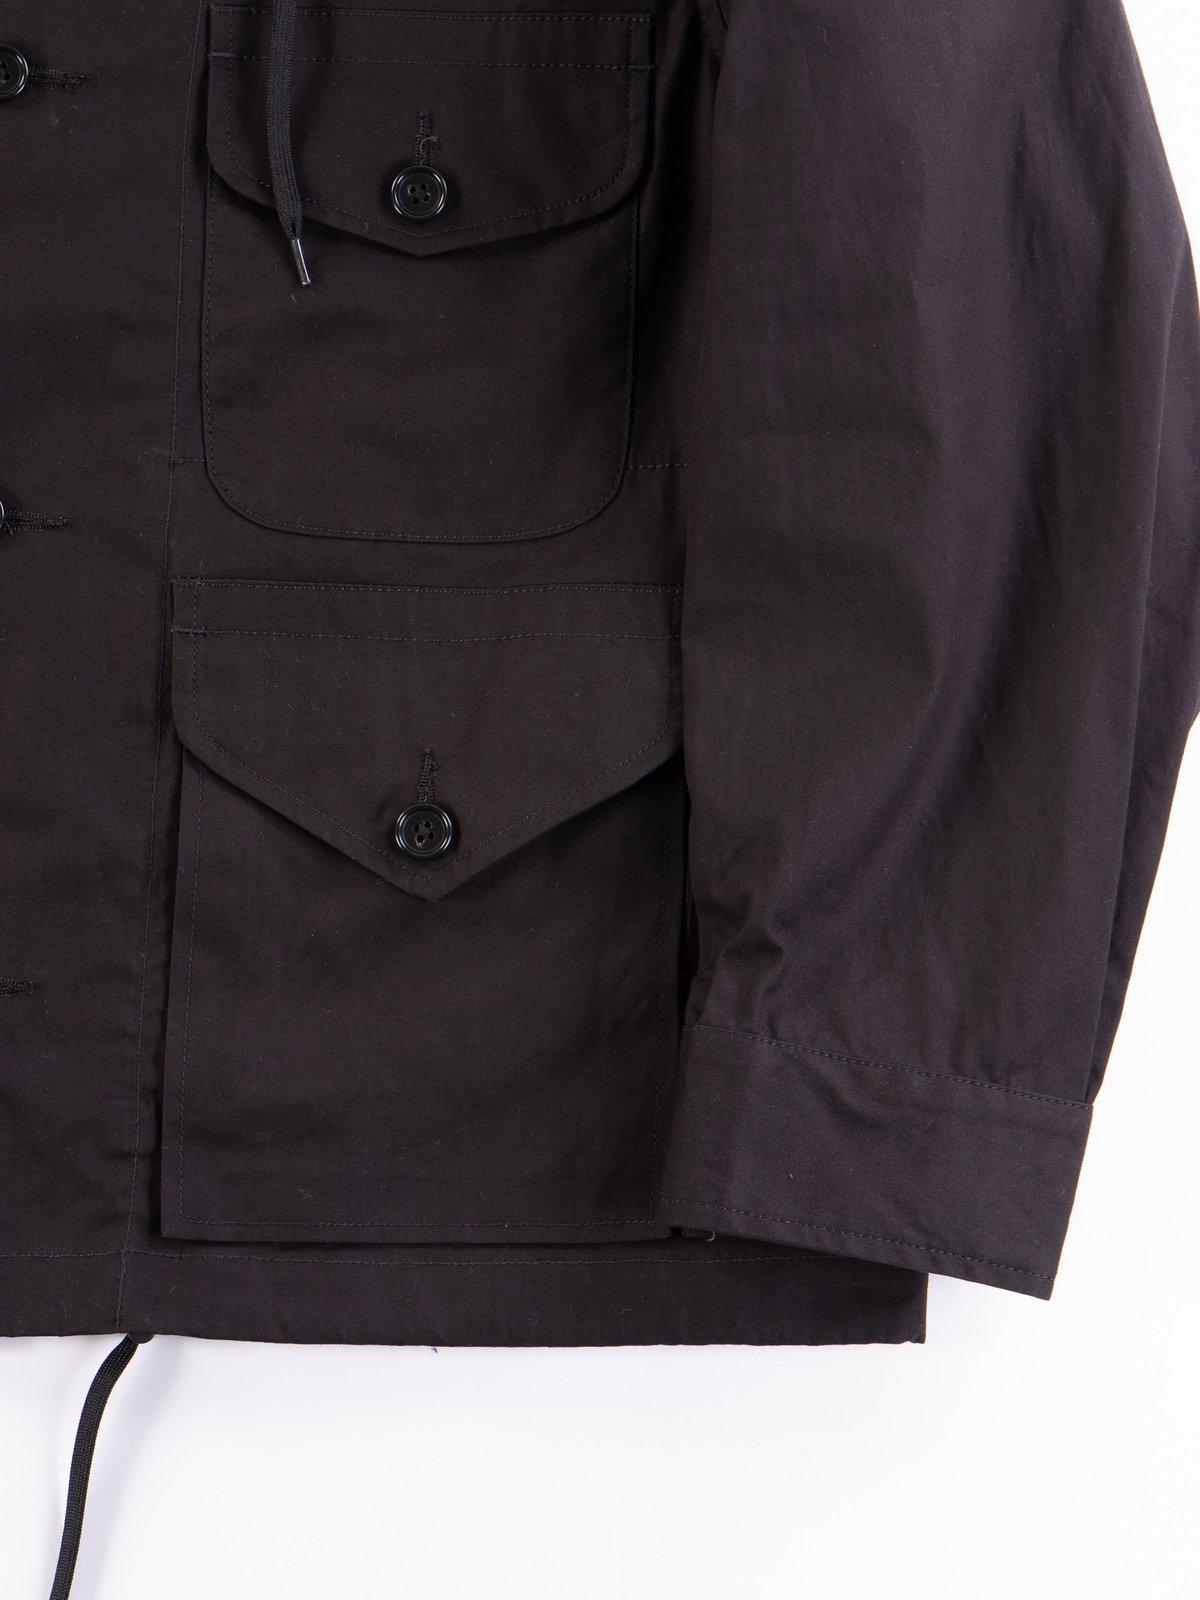 Deep Navy 10 Pockets Fishhunt Jacket - Image 5